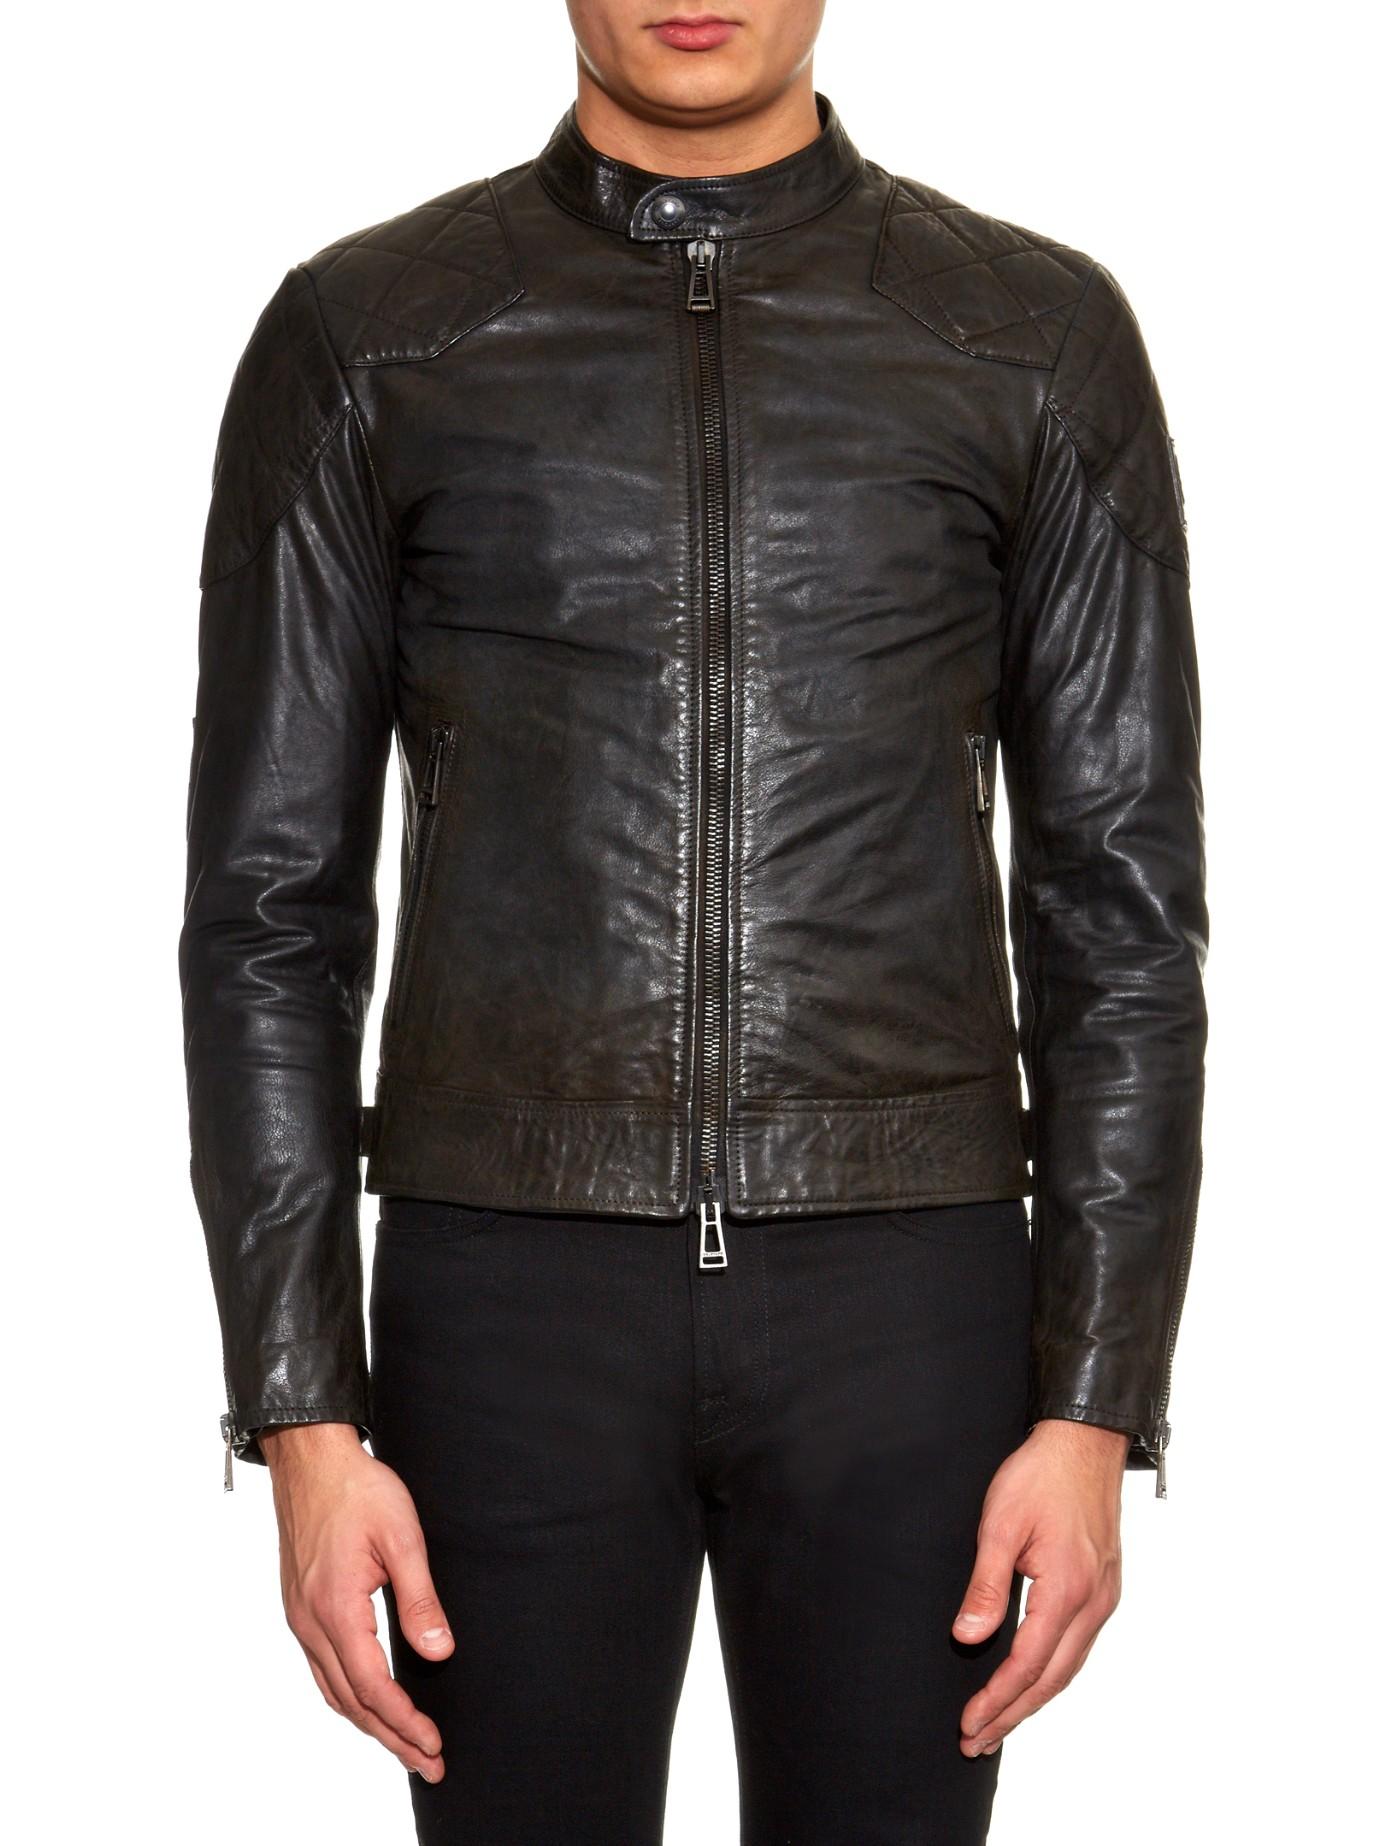 Belstaff Outlaw Leather Jacket In Black For Men Lyst